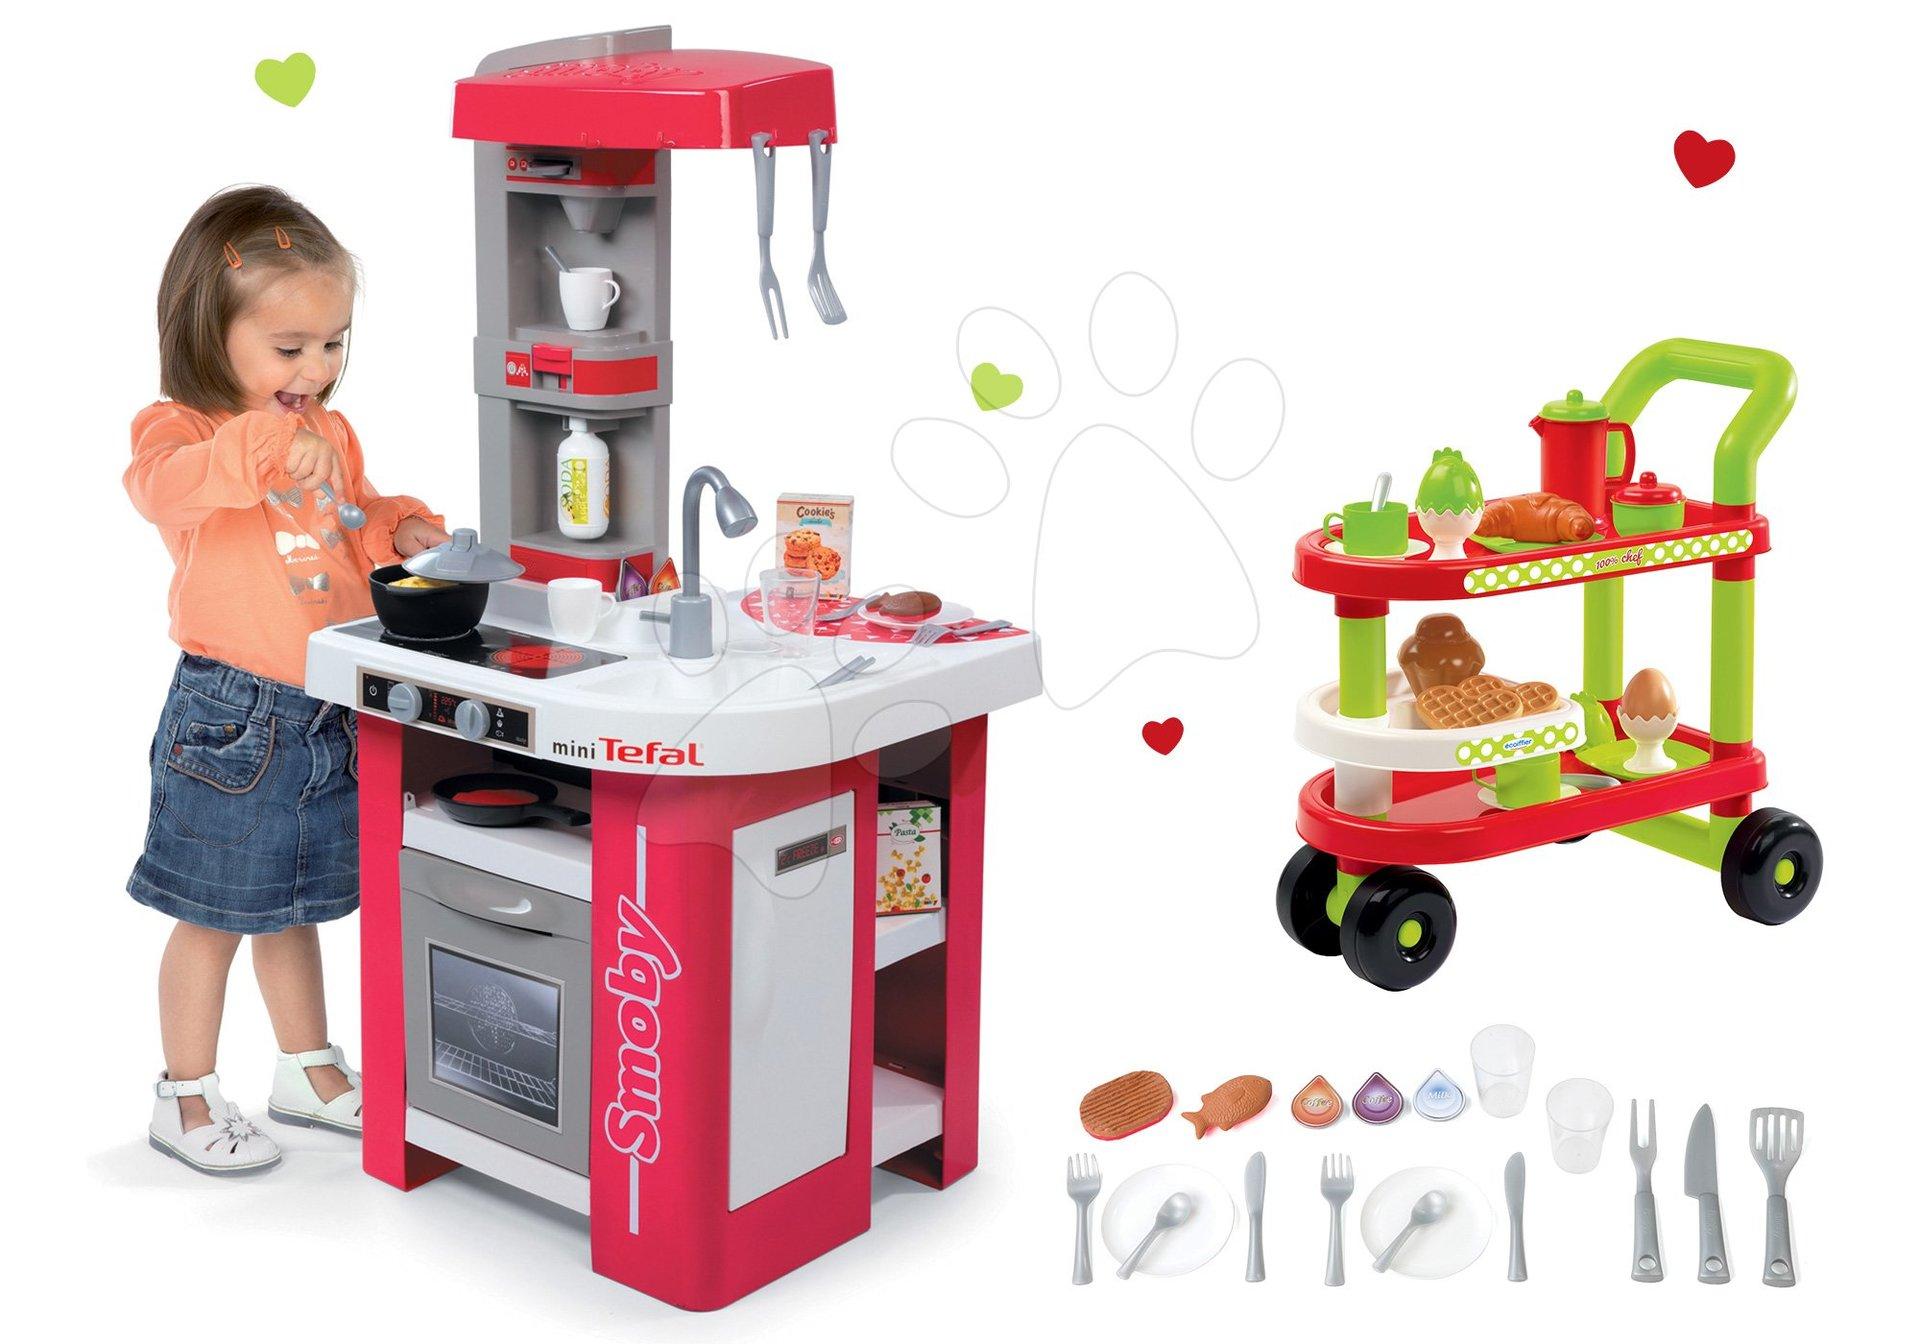 Smoby set detská kuchynka Tefal Studio elektronická a servírovací vozík s raňajkami 100% Chef 311022-11